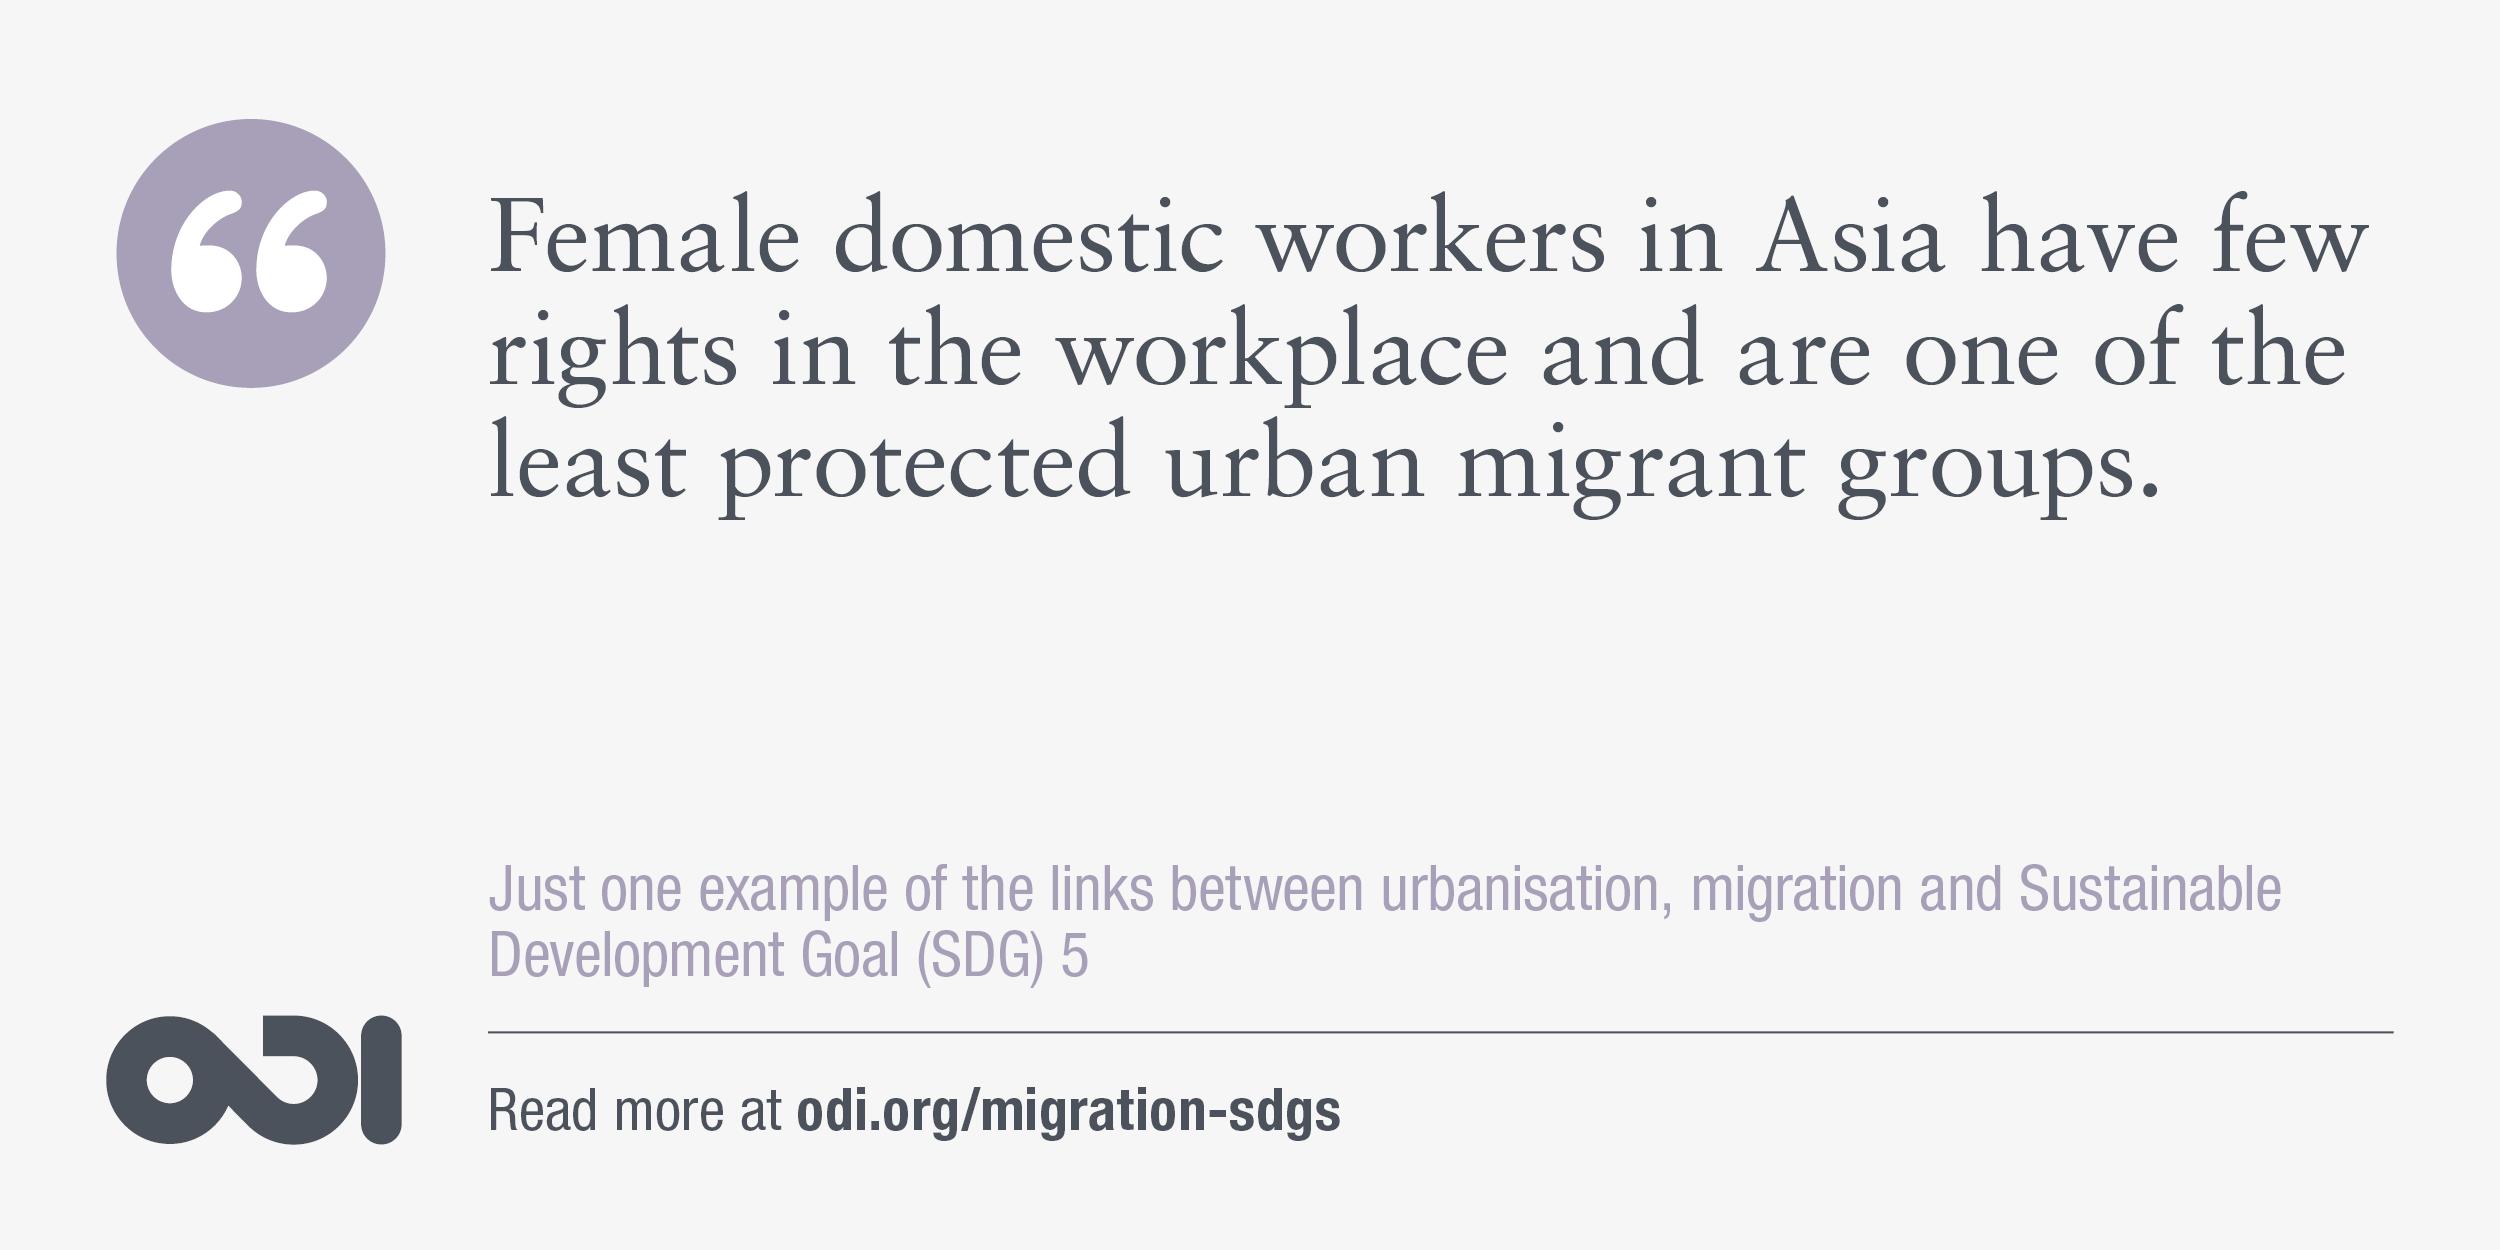 The links between urbanisation, migration and SDG 5.